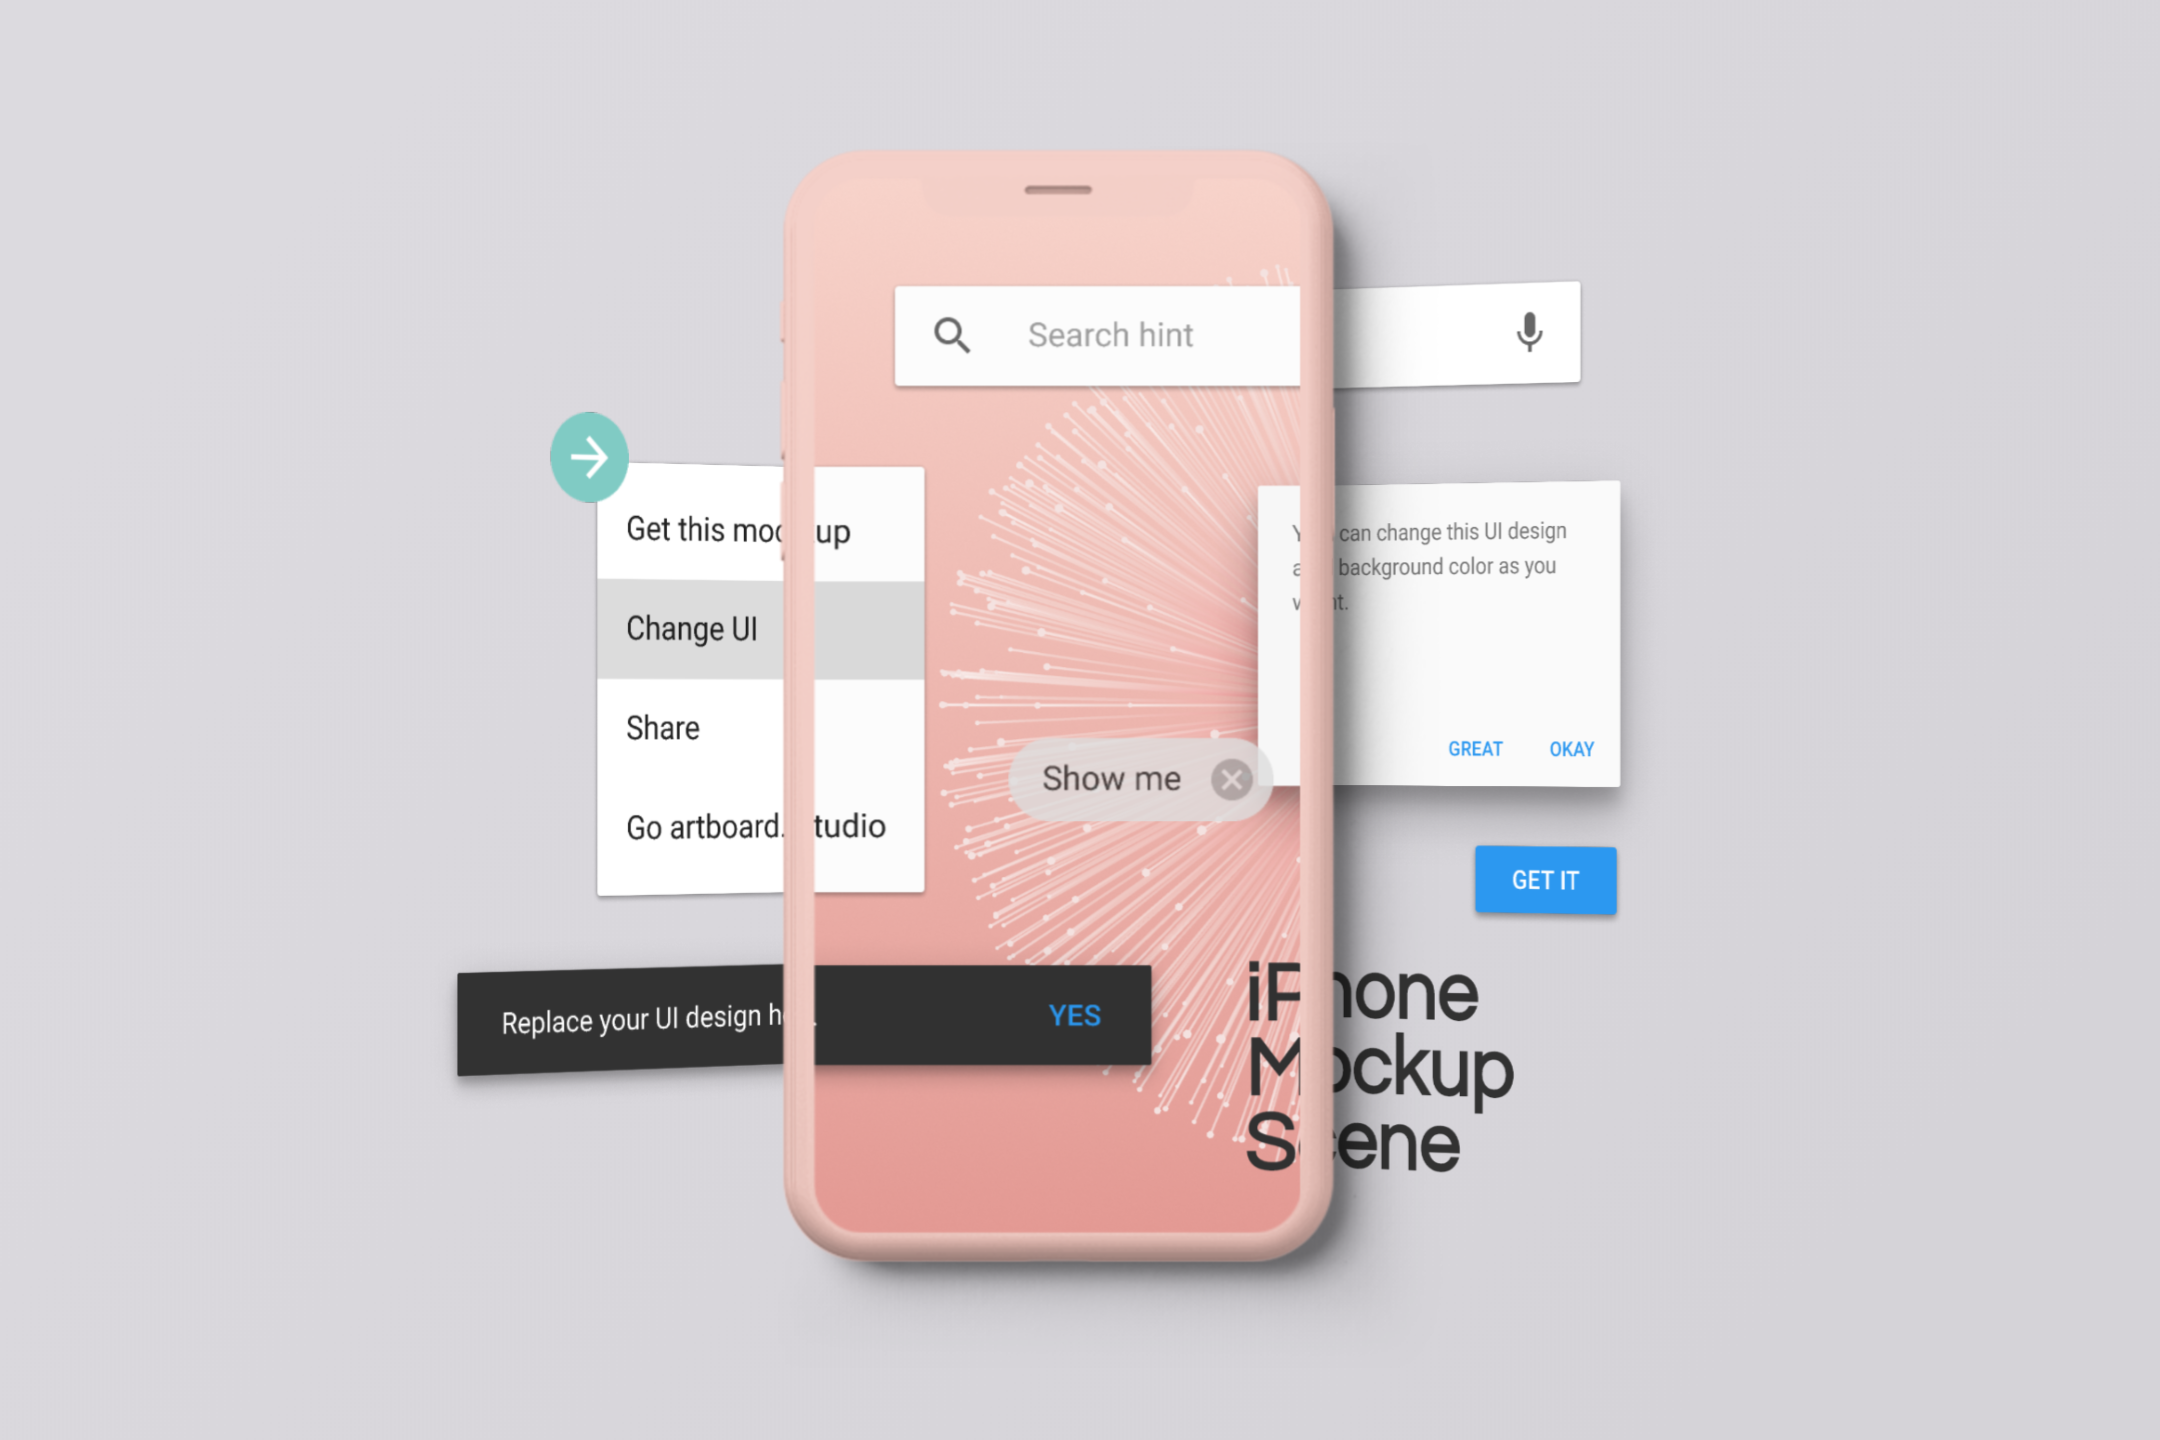 Multiple Screens Iphone Mockup Scene Iphone Mockup Free Mockup Templates Templates